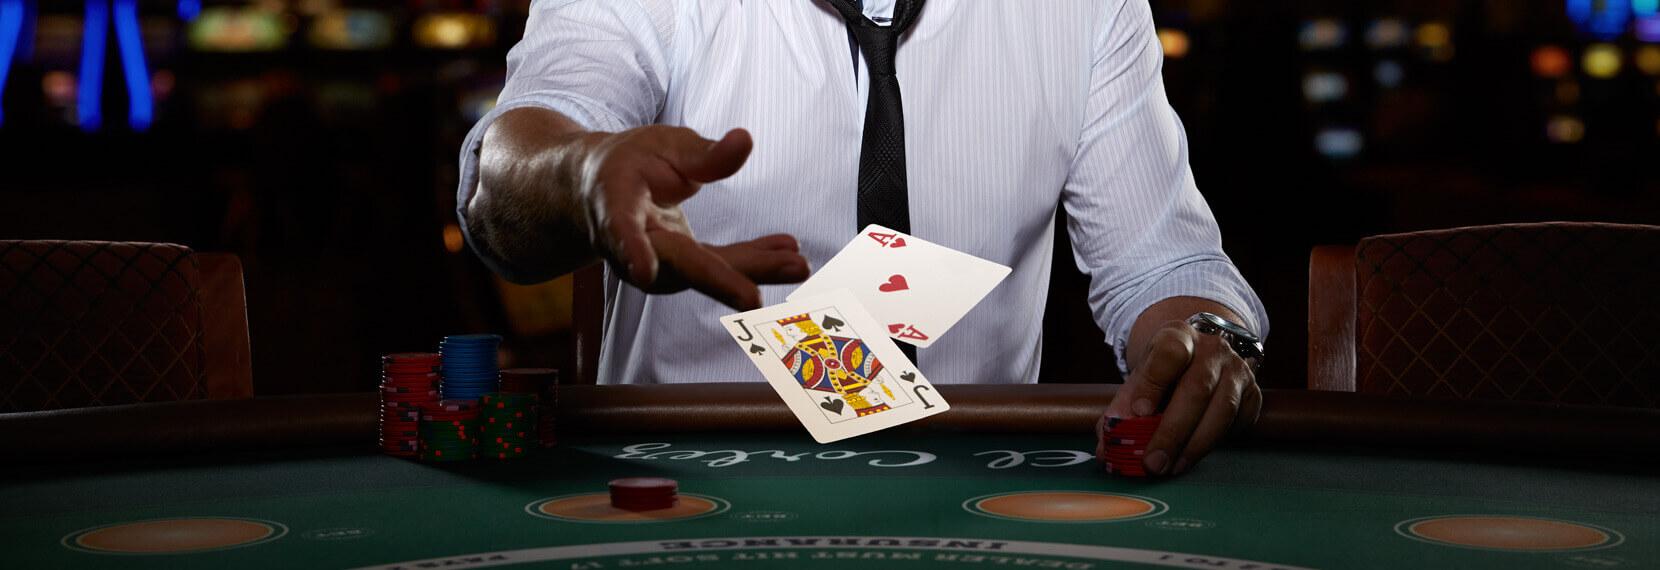 images2blackjack-17.jpg